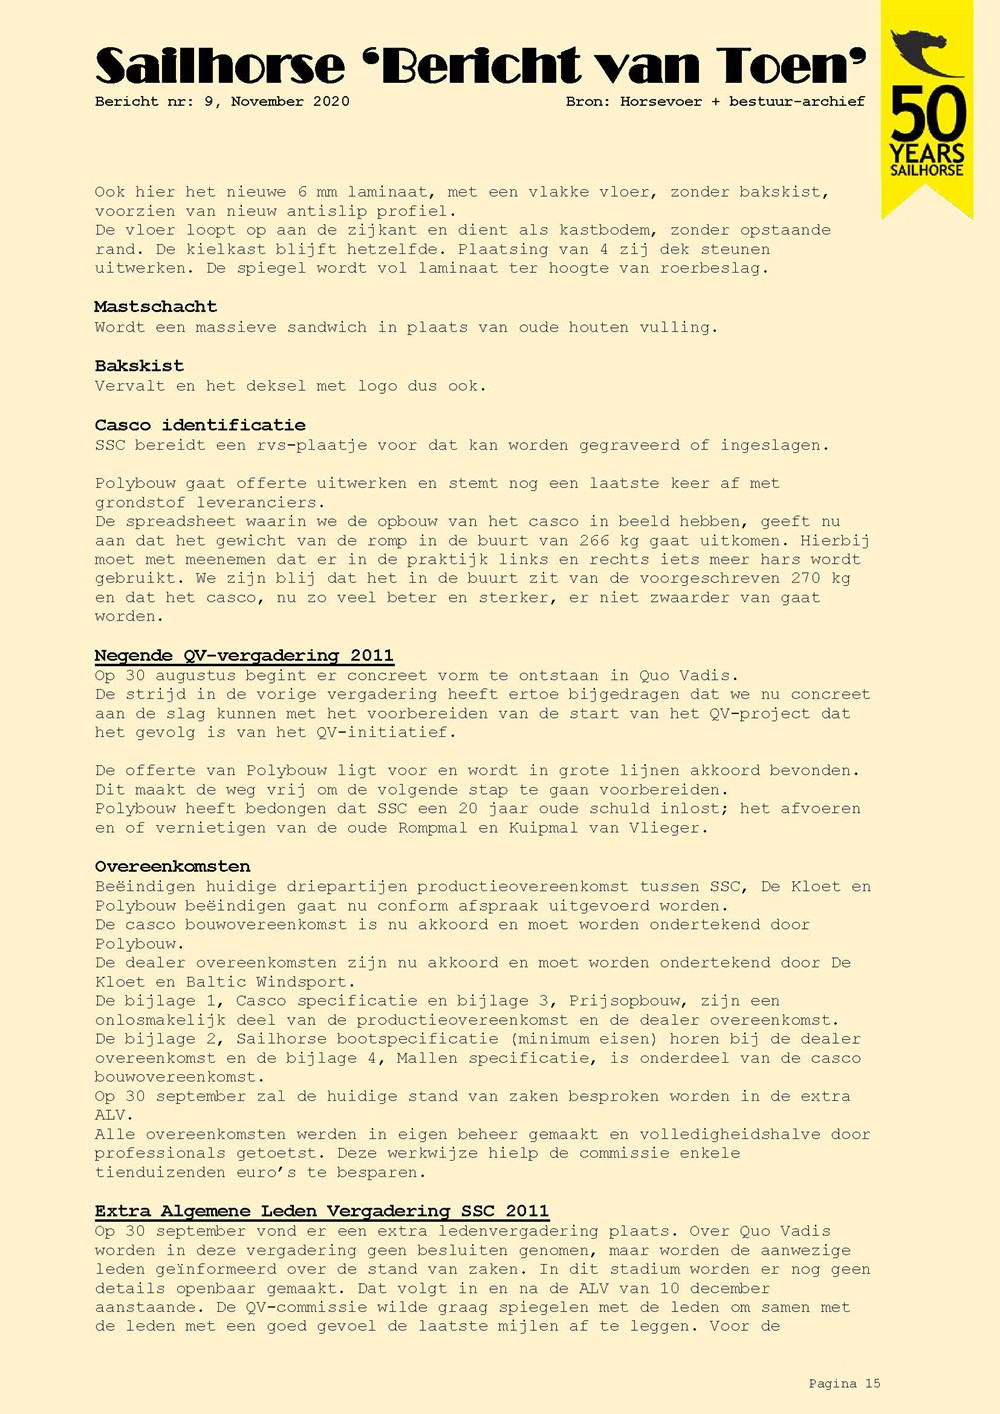 BvT09_Page_15.jpg